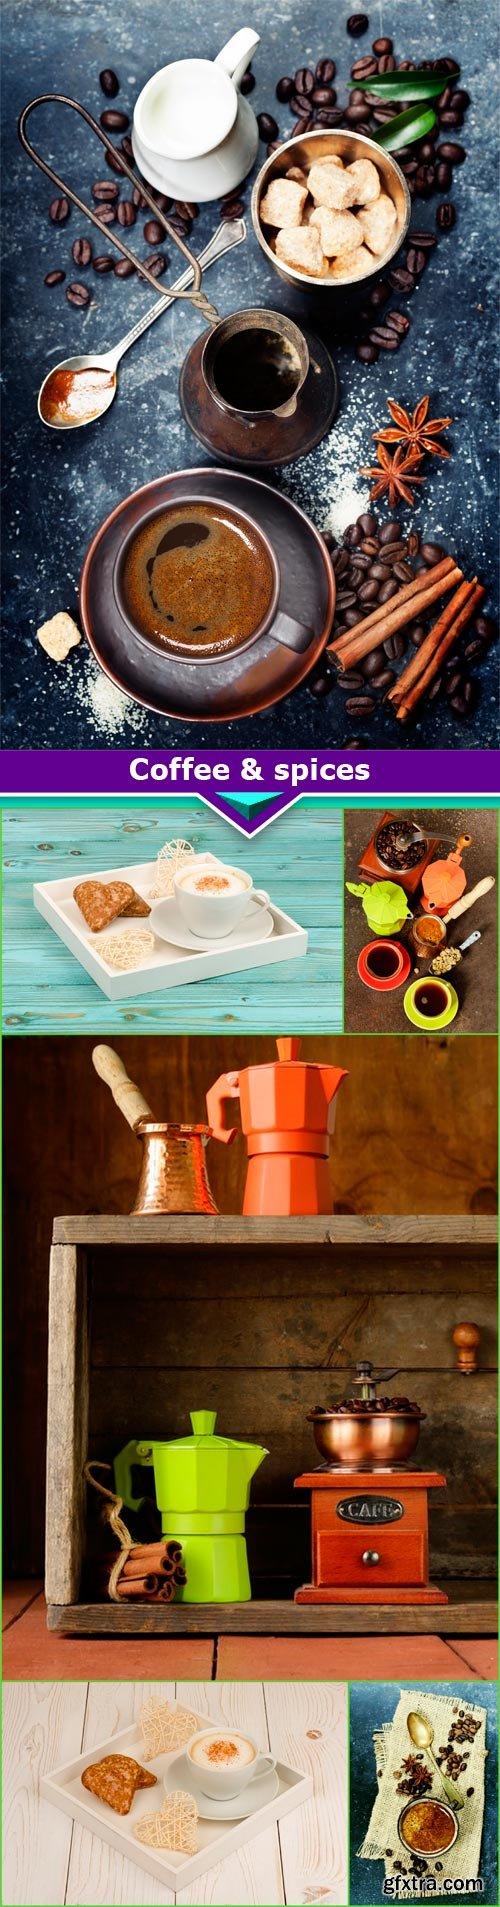 Coffee & spices 6x JPEG